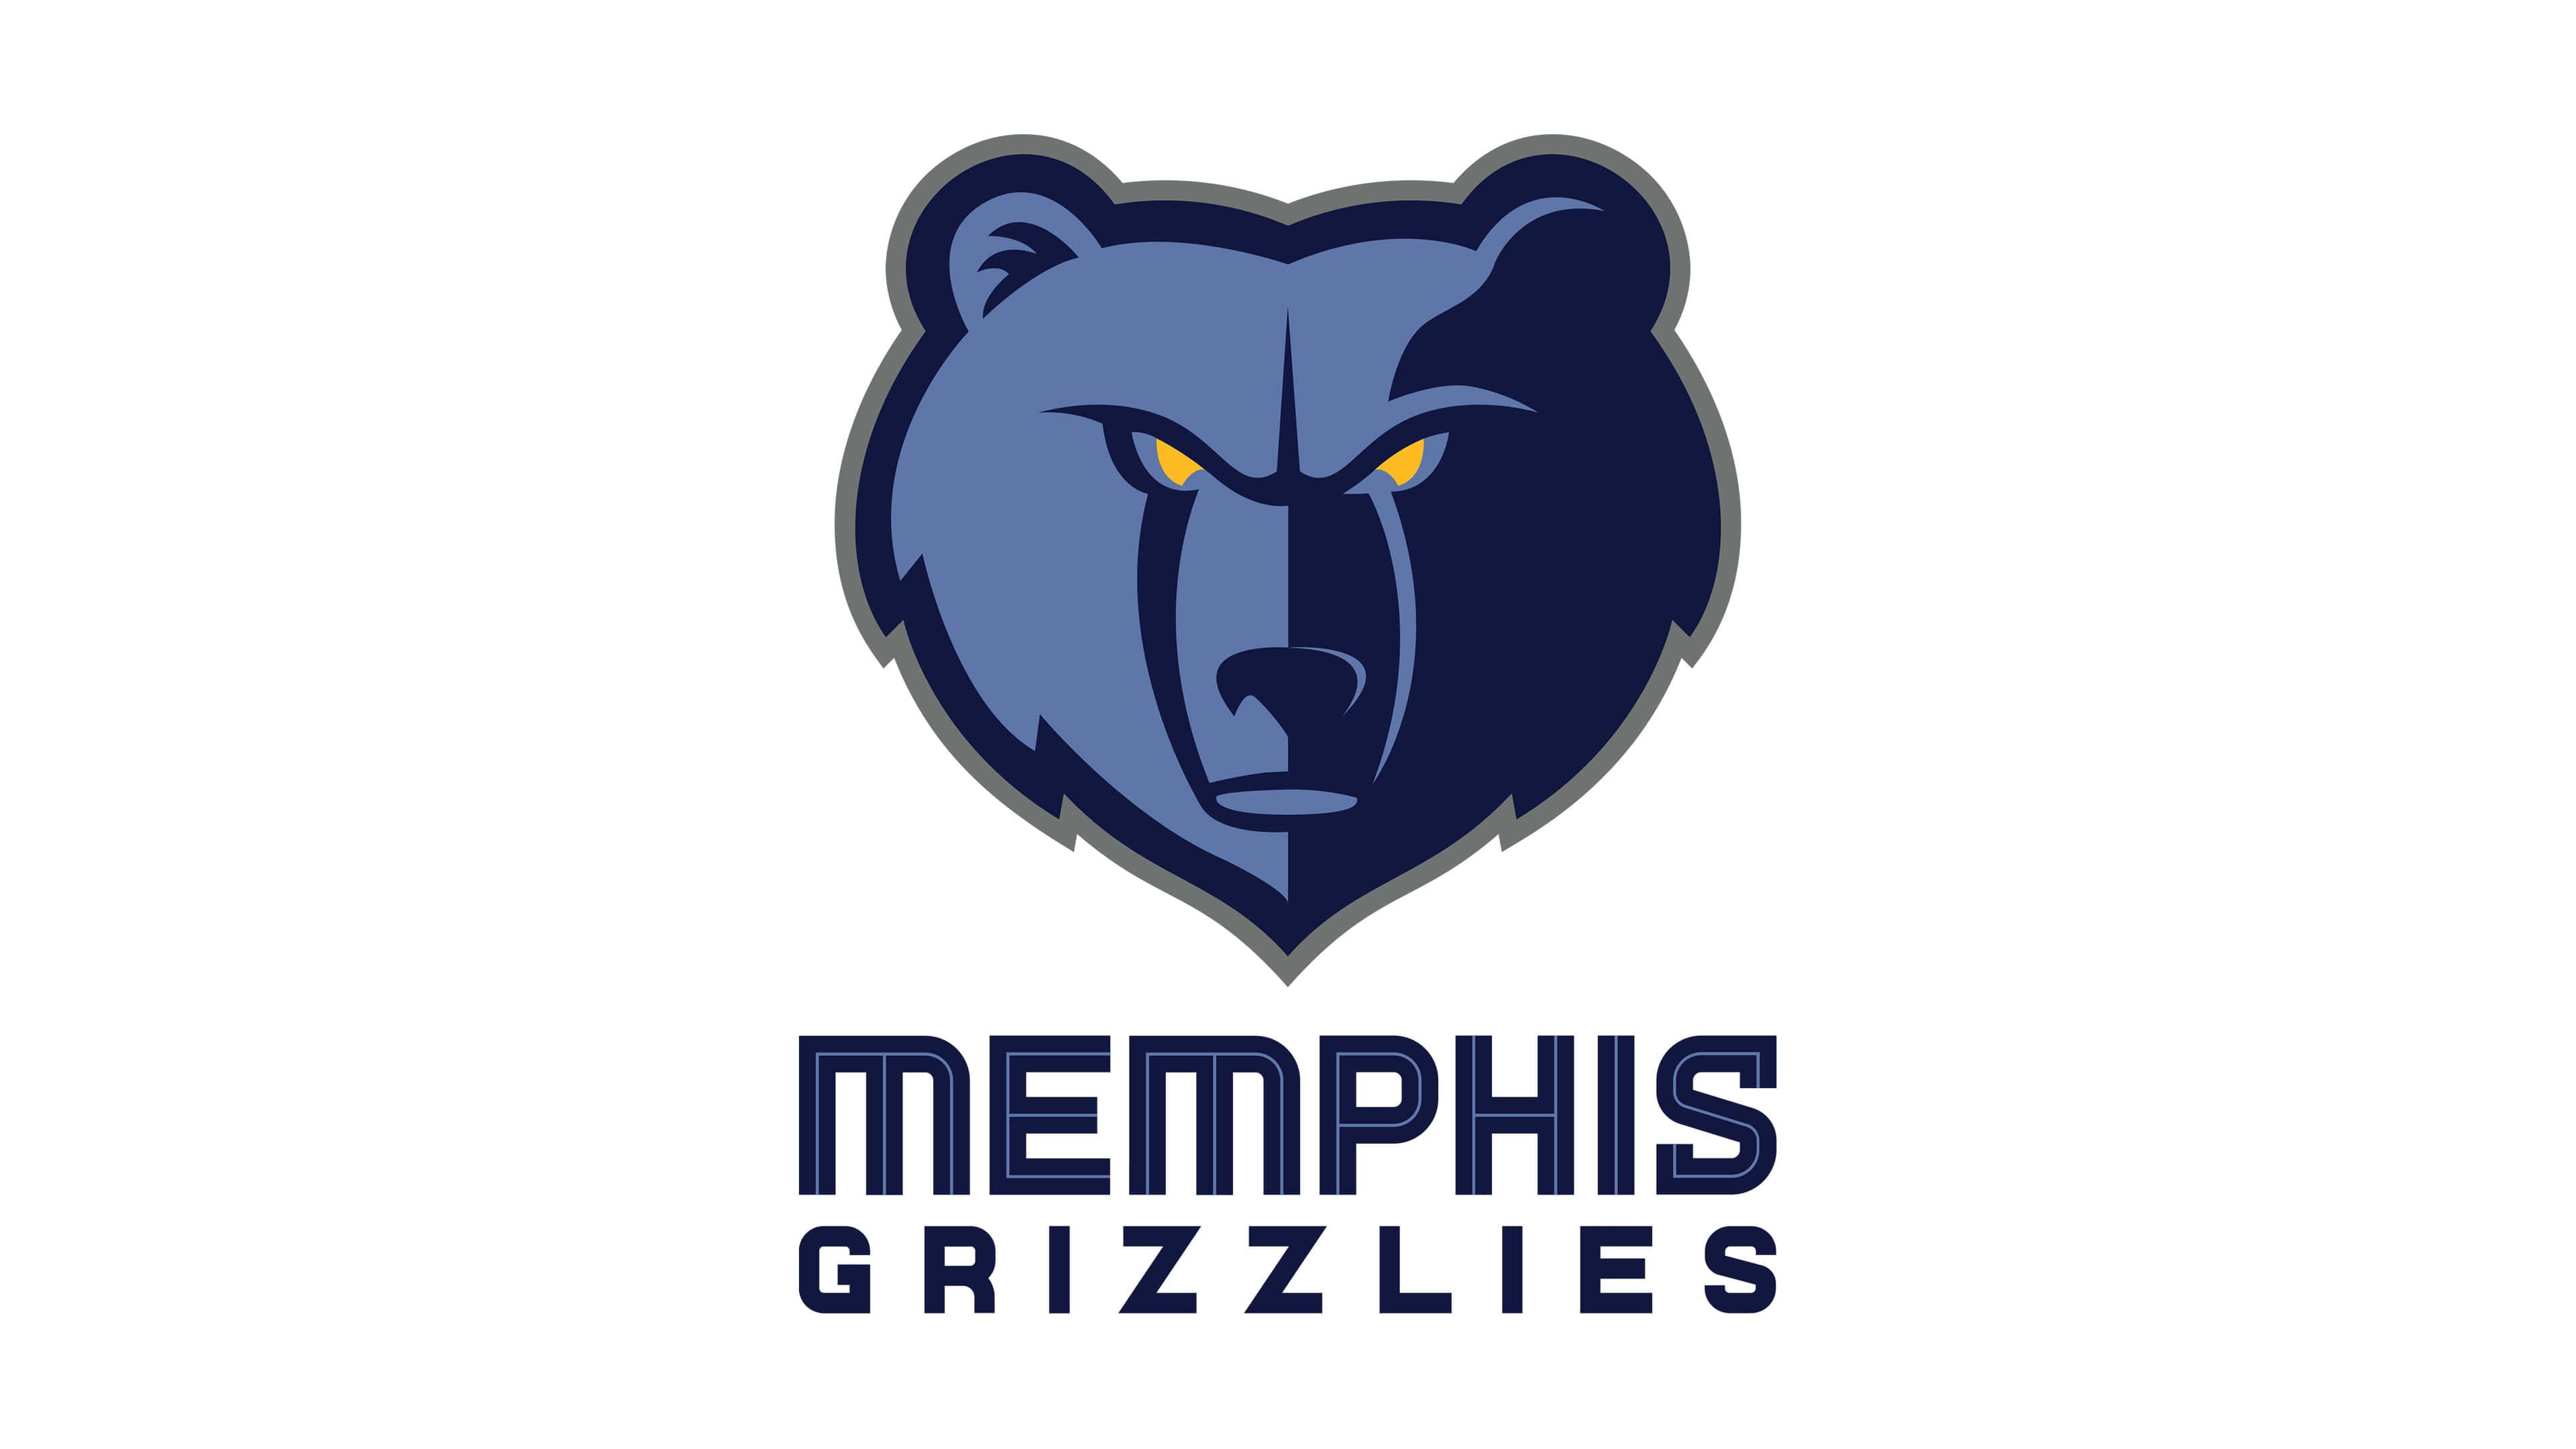 memphis grizzlies nba logo uhd 4k wallpaper